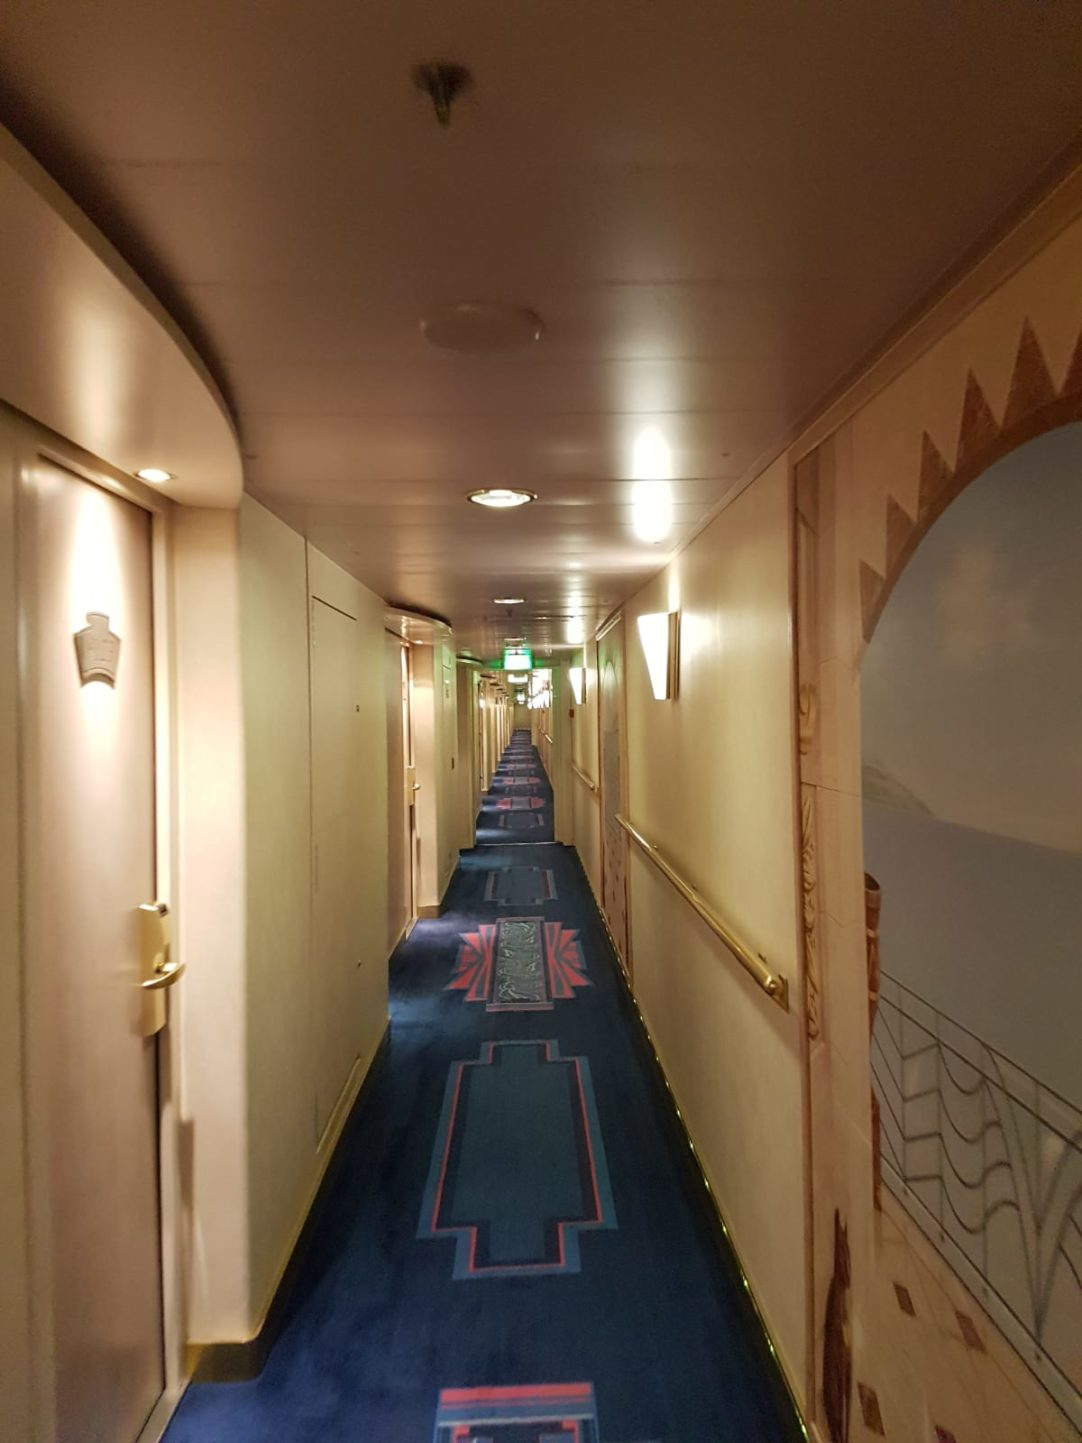 Pasillos interiores del MSC Música.